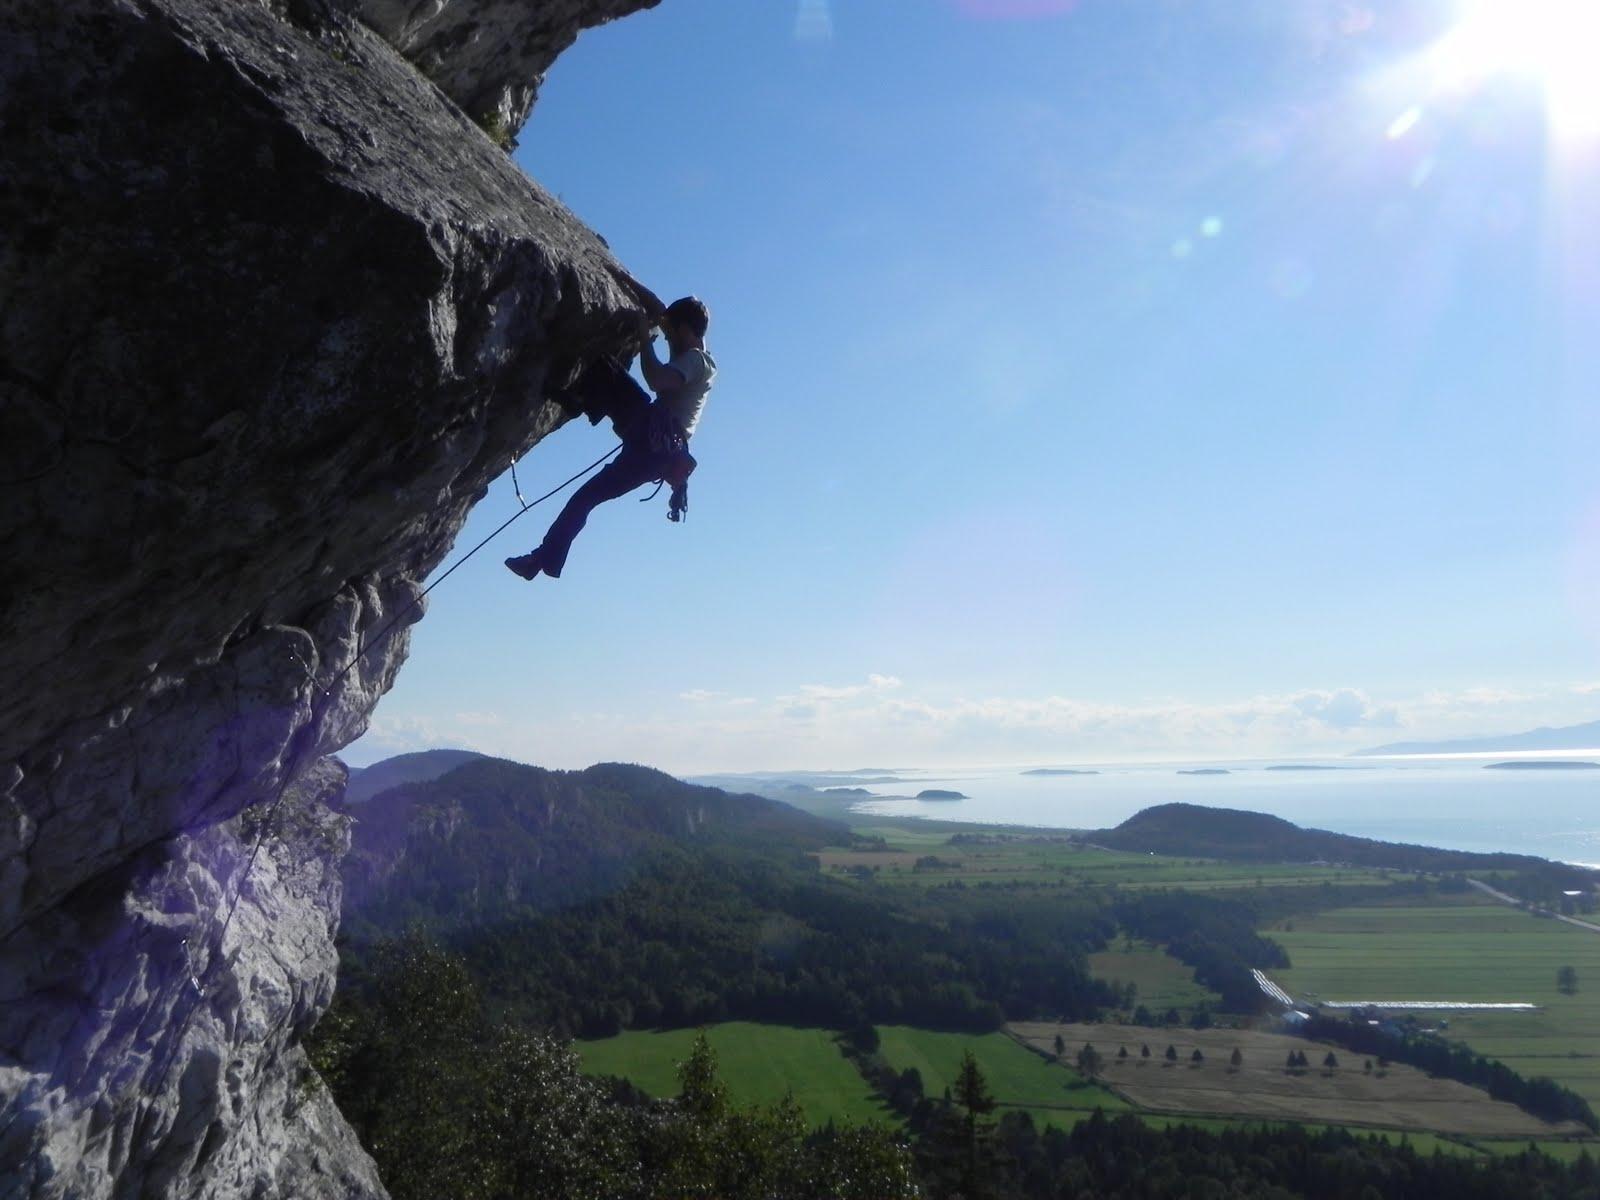 overhang  rock formation